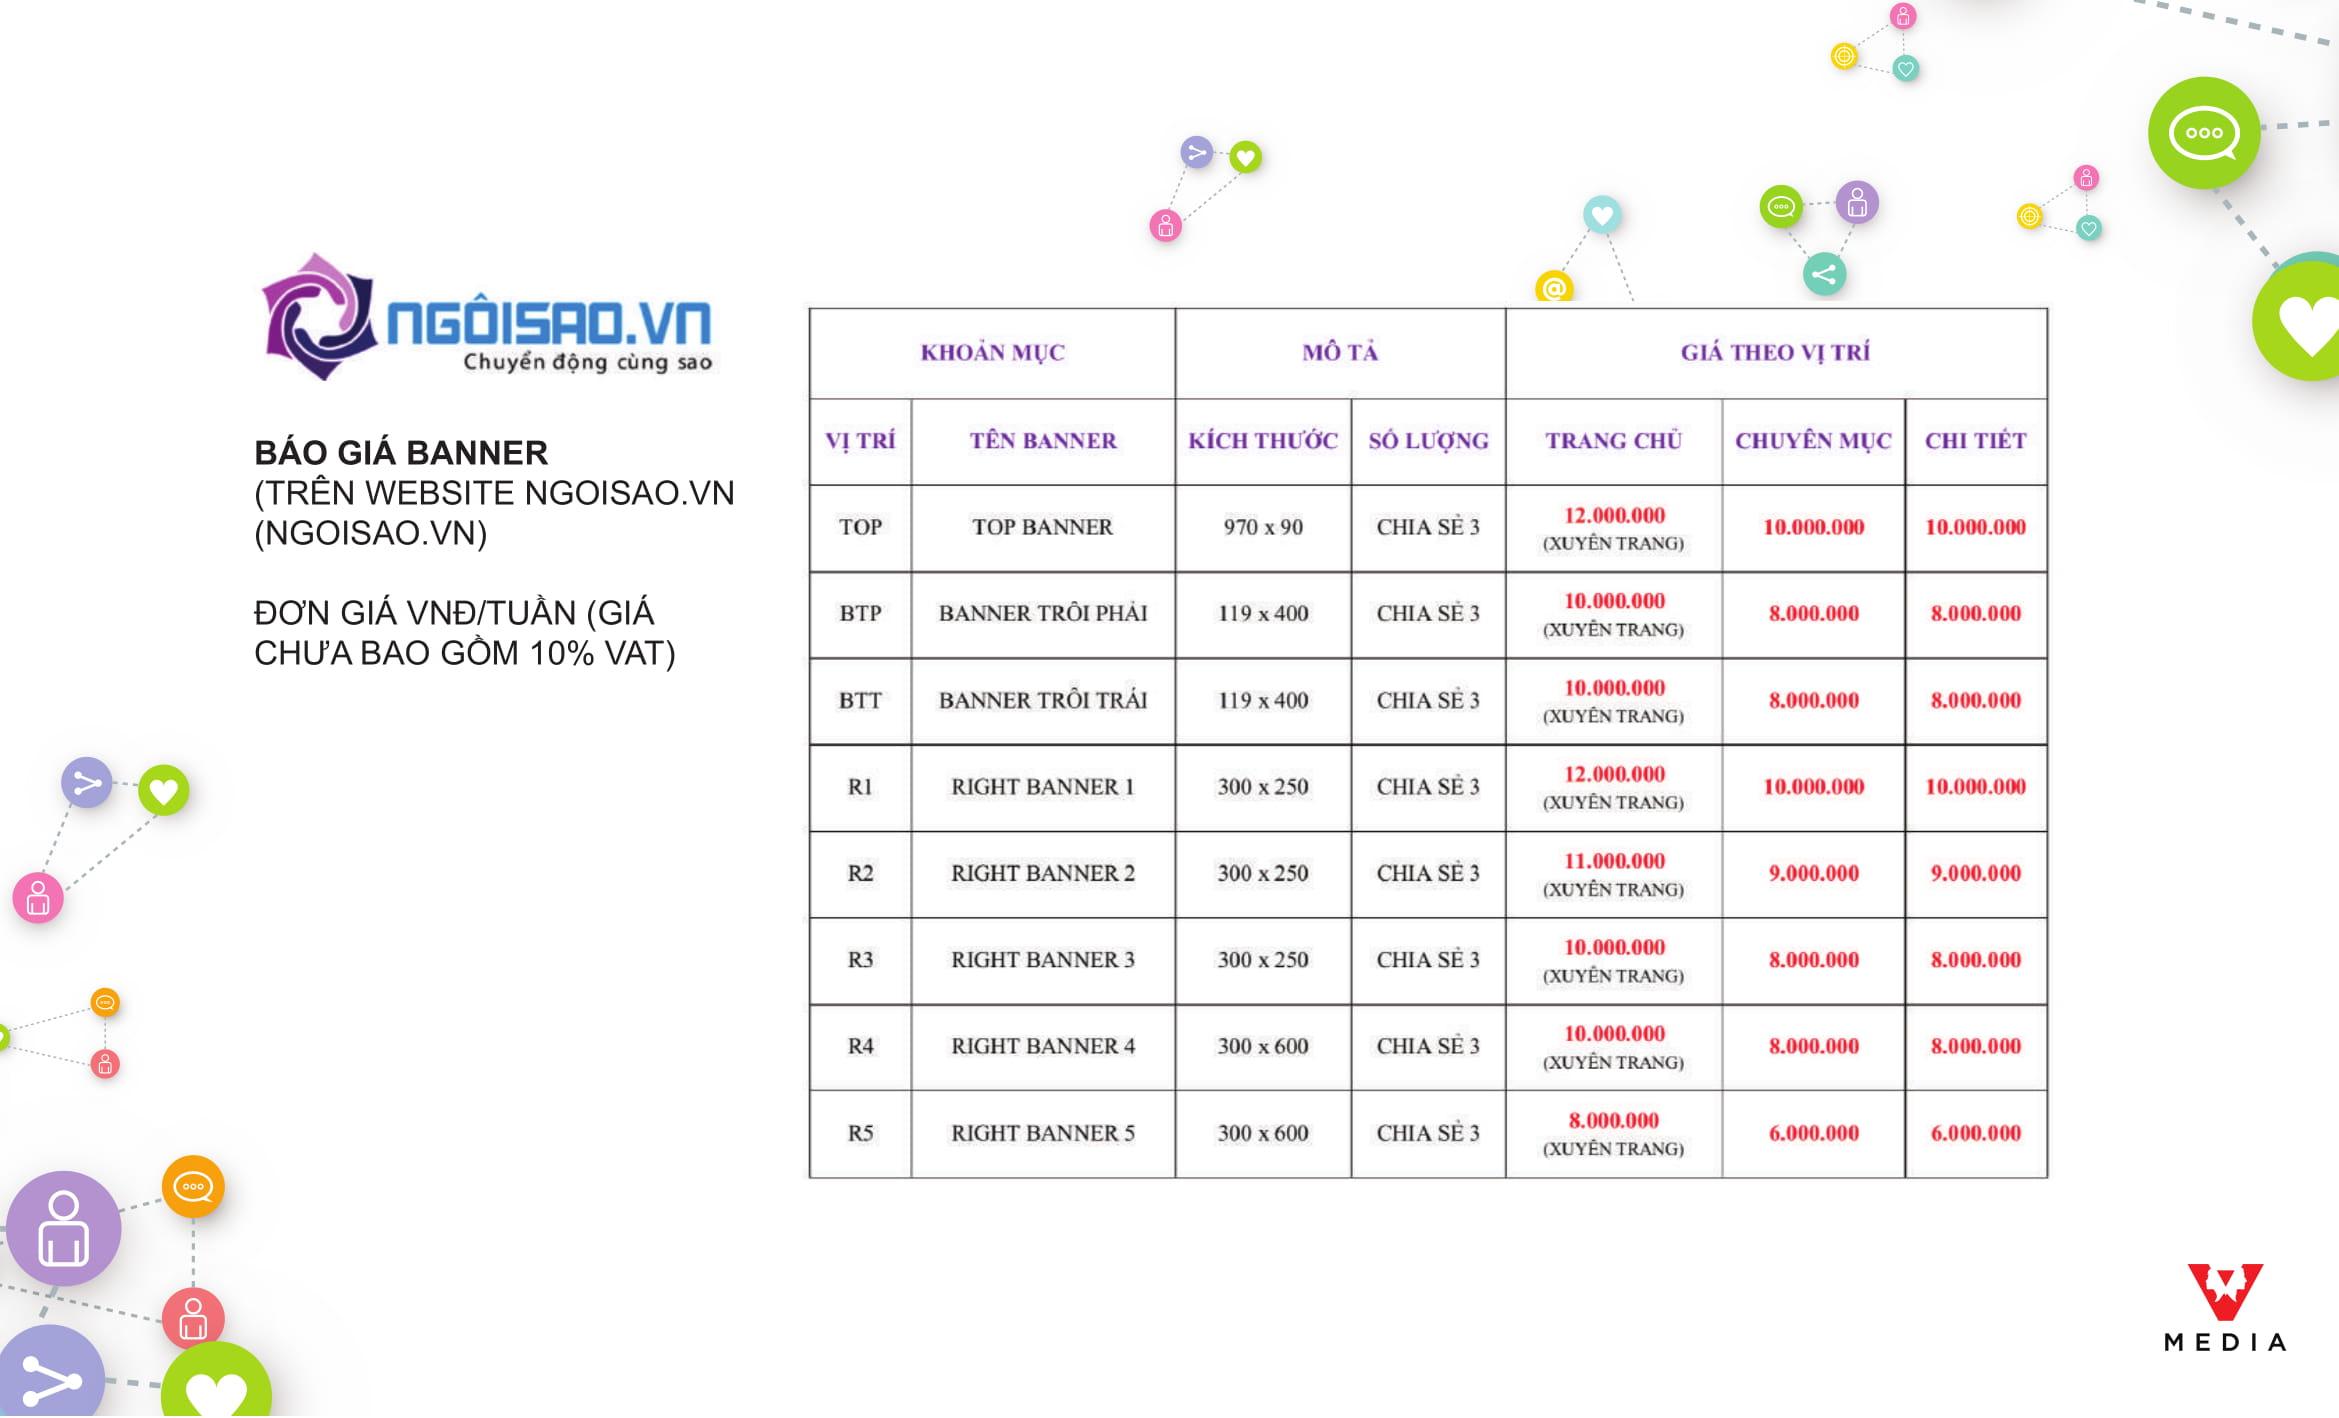 vmediaprensent-compressed-08-ngoisao.vn-w2339-h1418 7